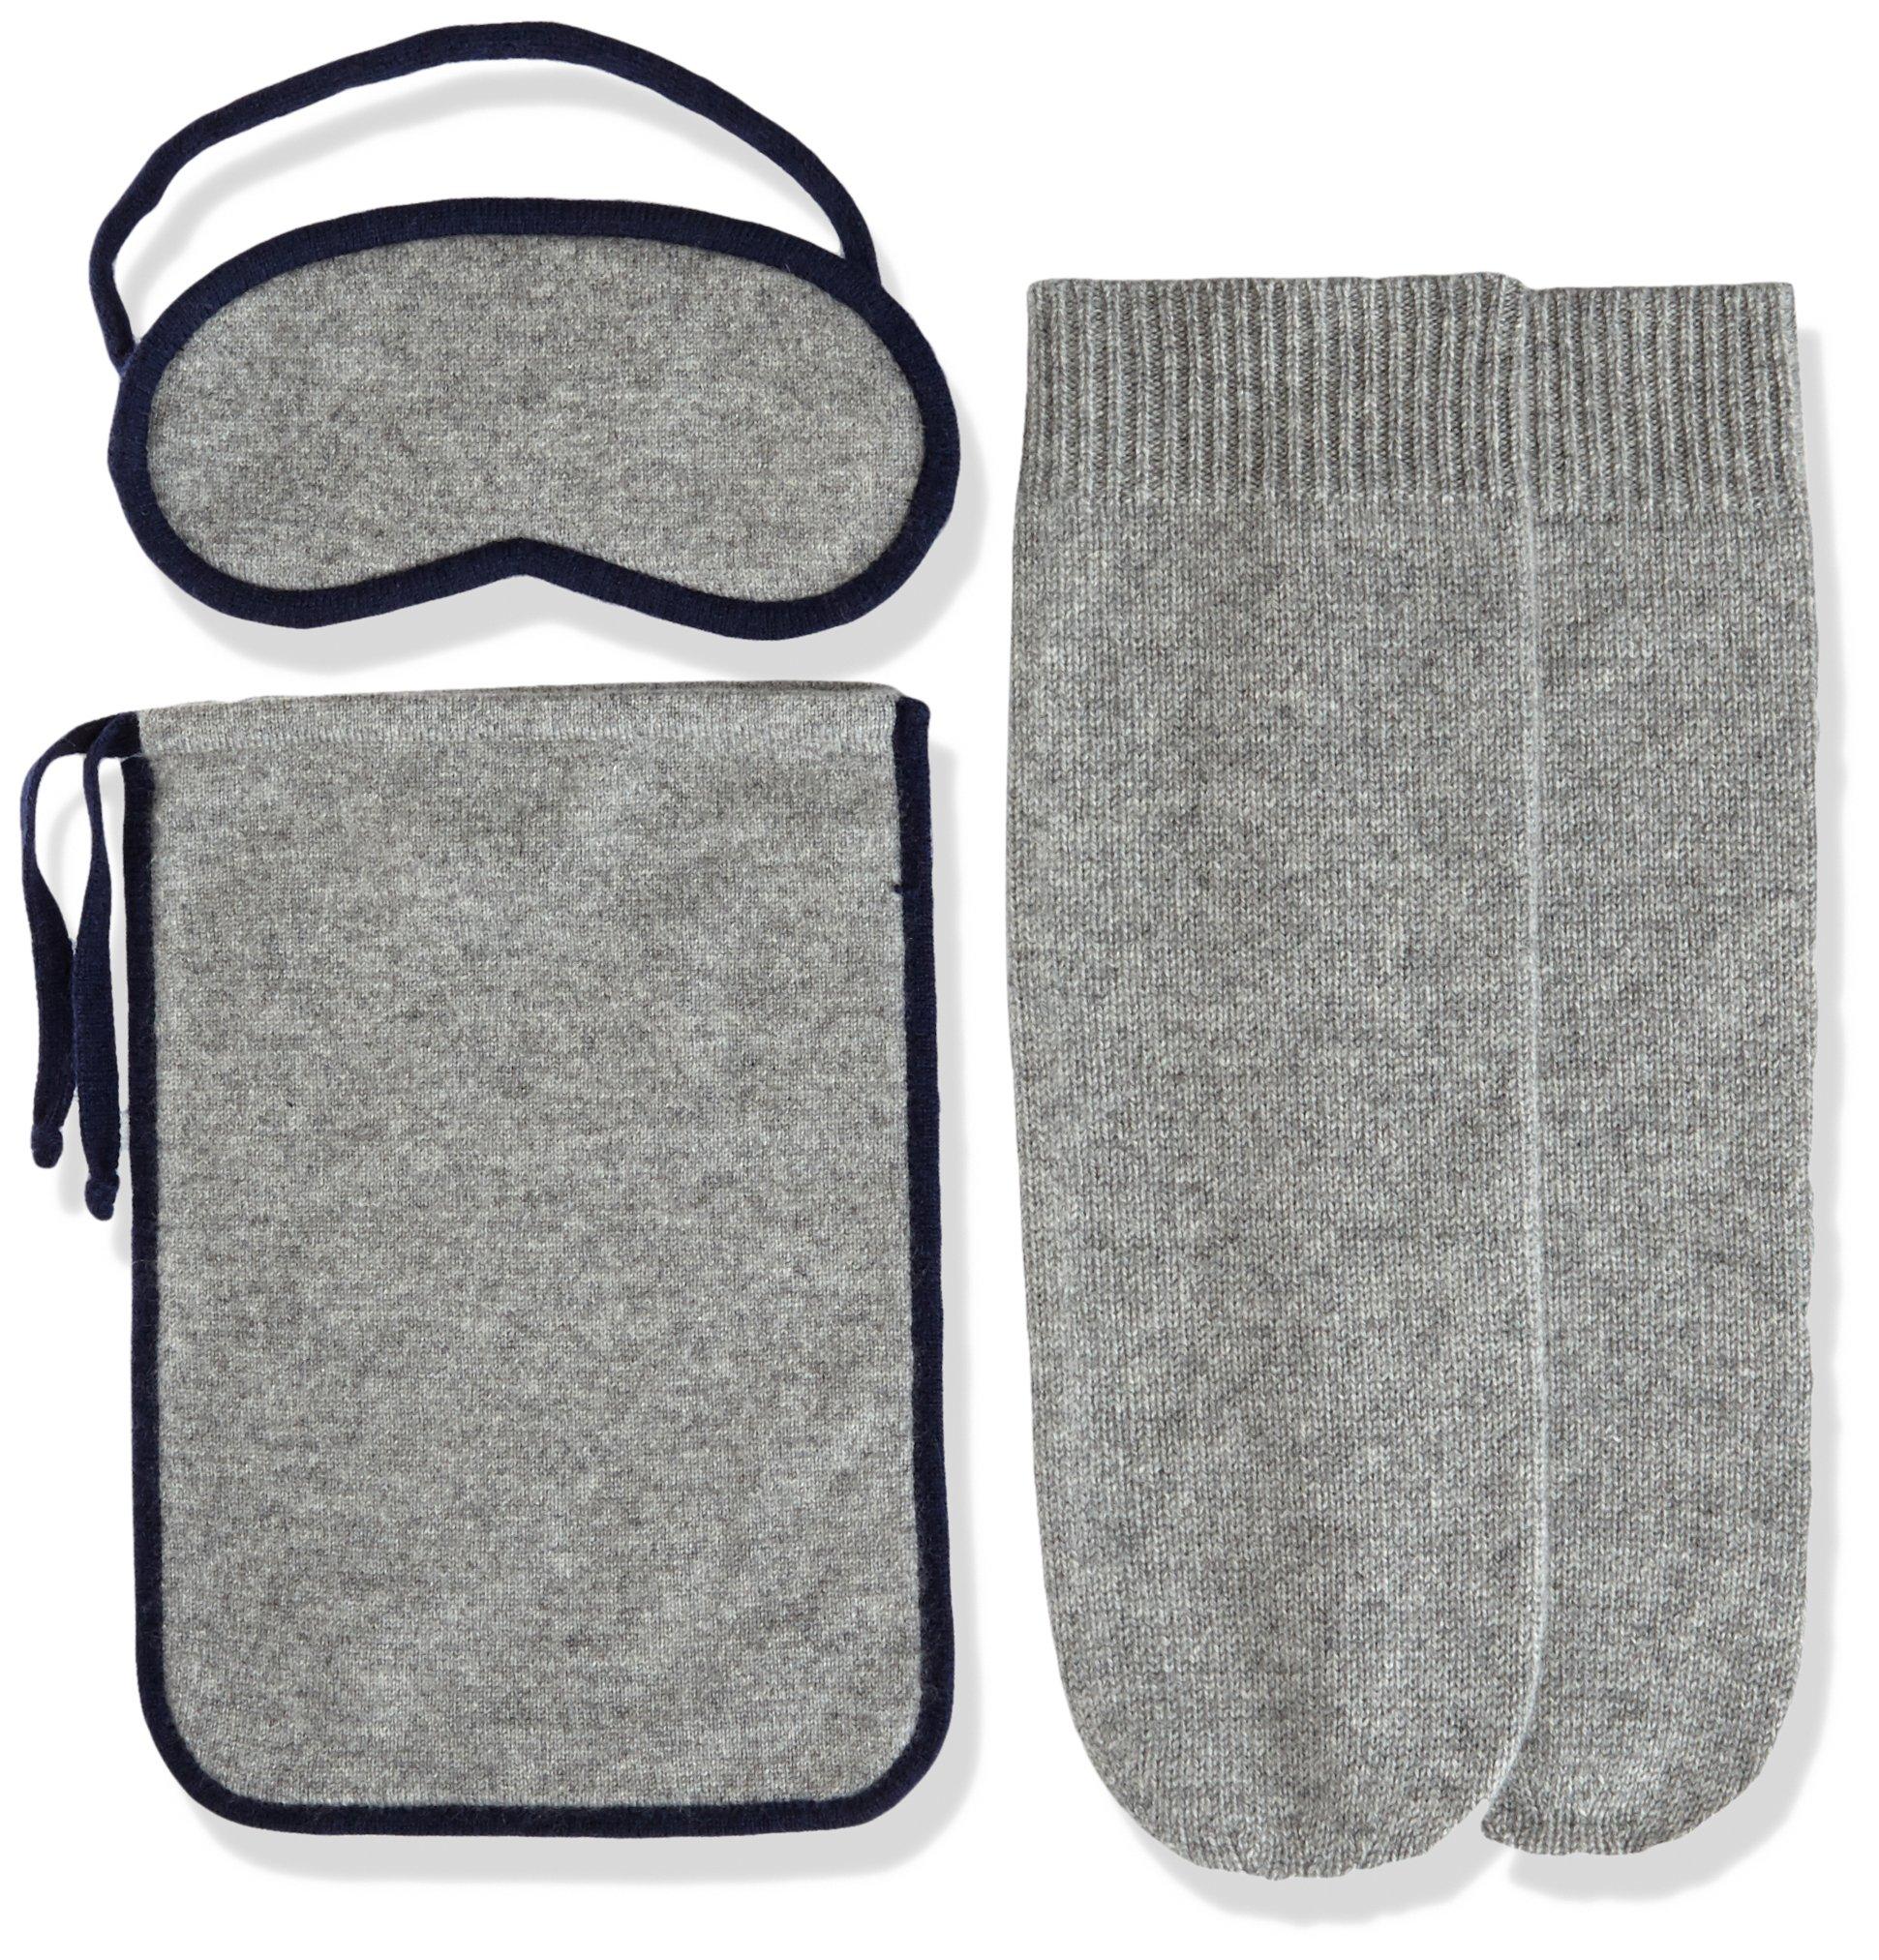 Sofia Cashmere Women's Cashmere Travel Set-Eyemask and Socks, Cloudburst ZY71137 + Navy ZY53372, ONE